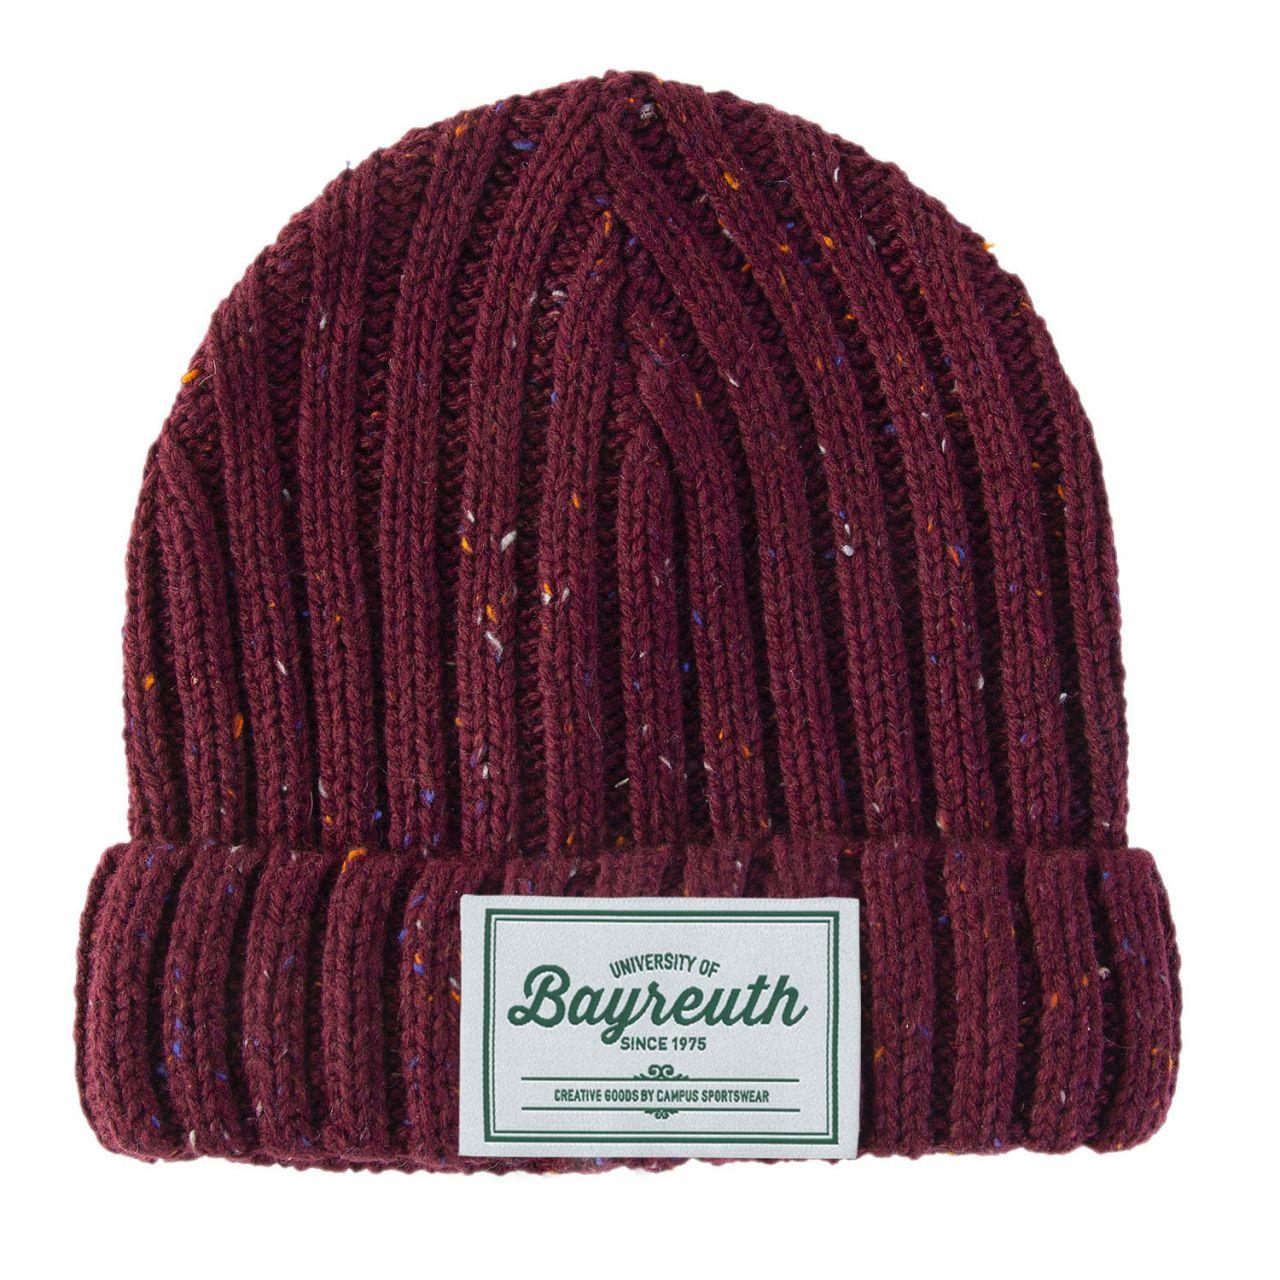 Strickmütze, burgundy, label